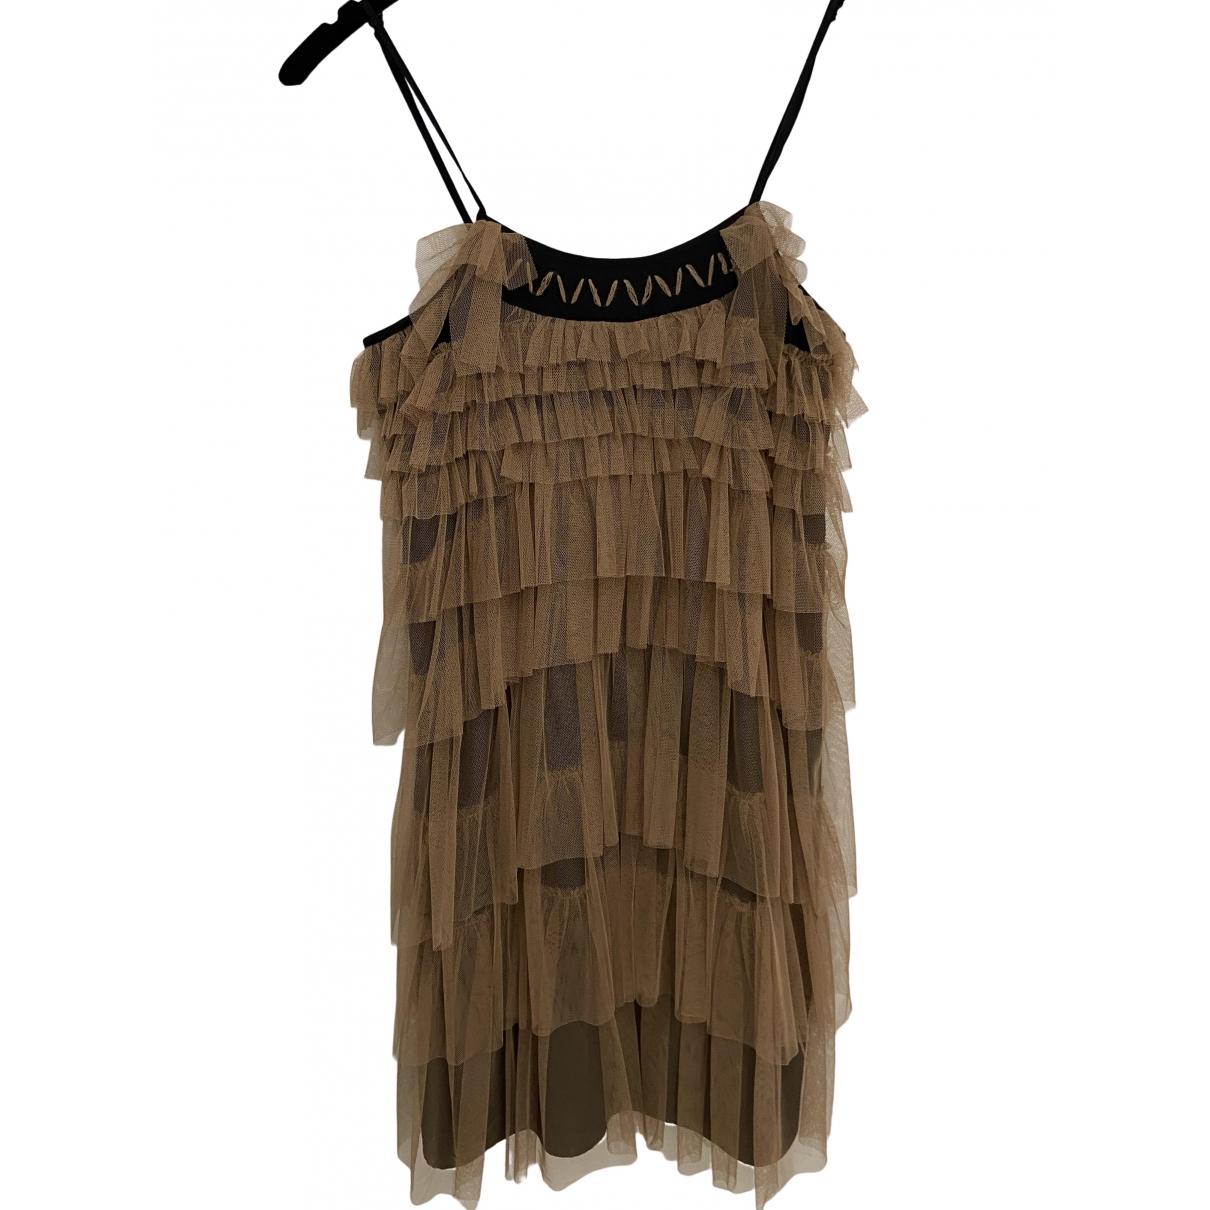 Liu.jo \N Kleid in  Beige Polyester